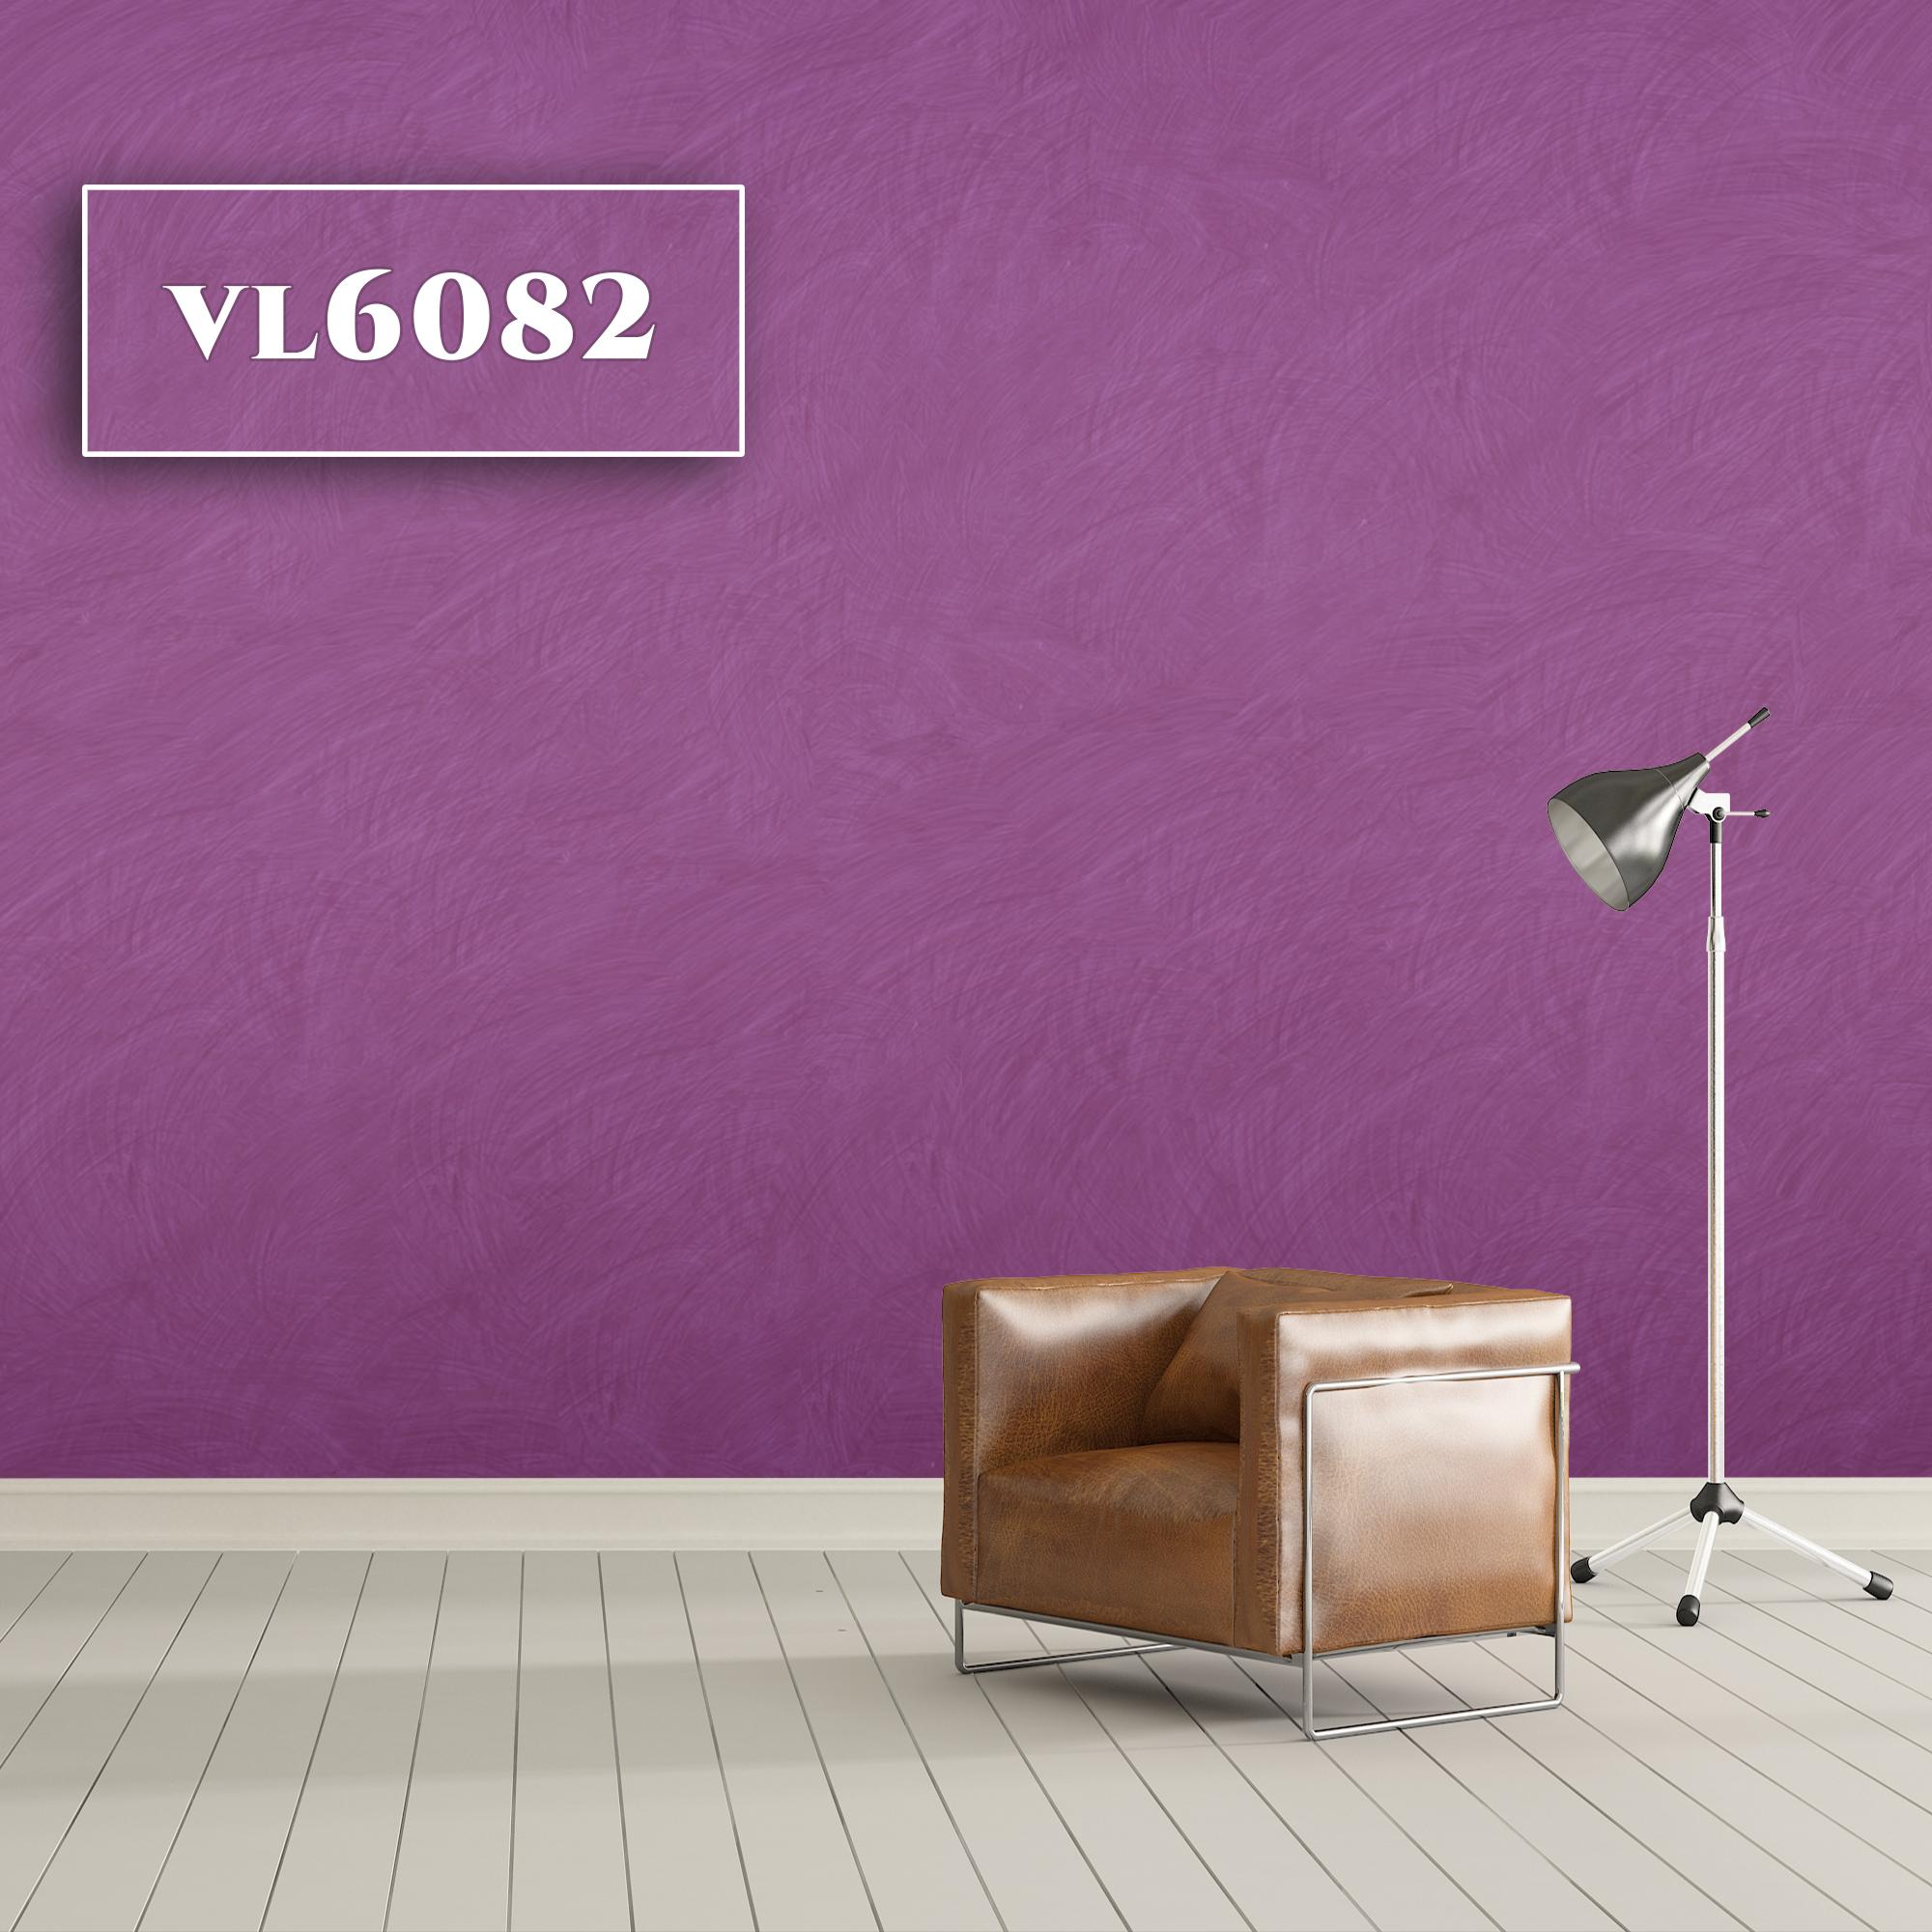 VL6082